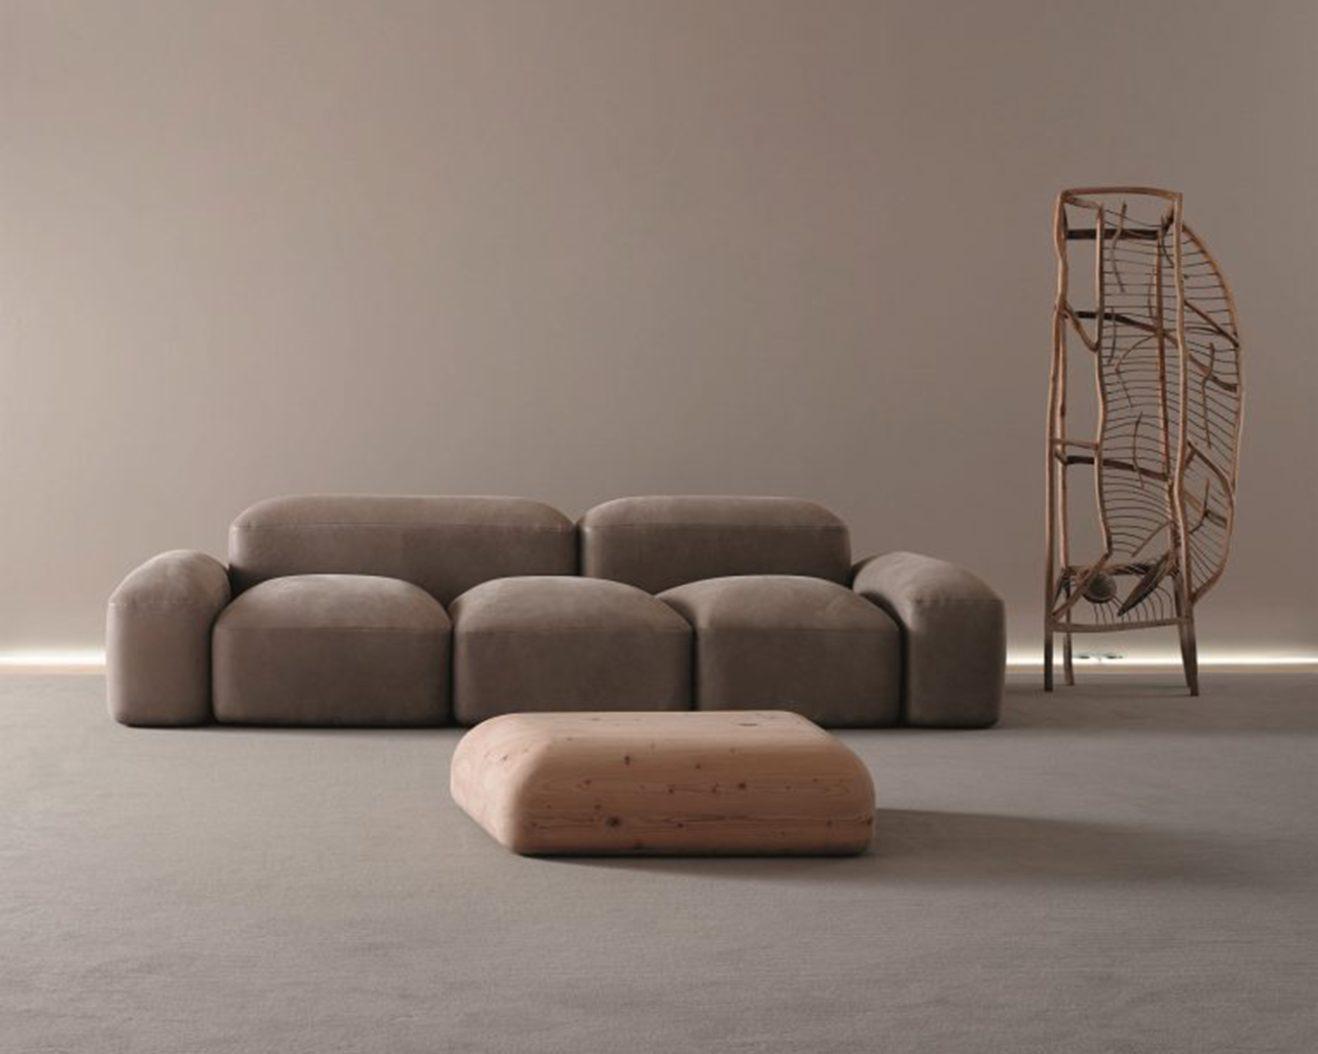 Lapis-sofa-amuralab-emanuel-gargano-2-1